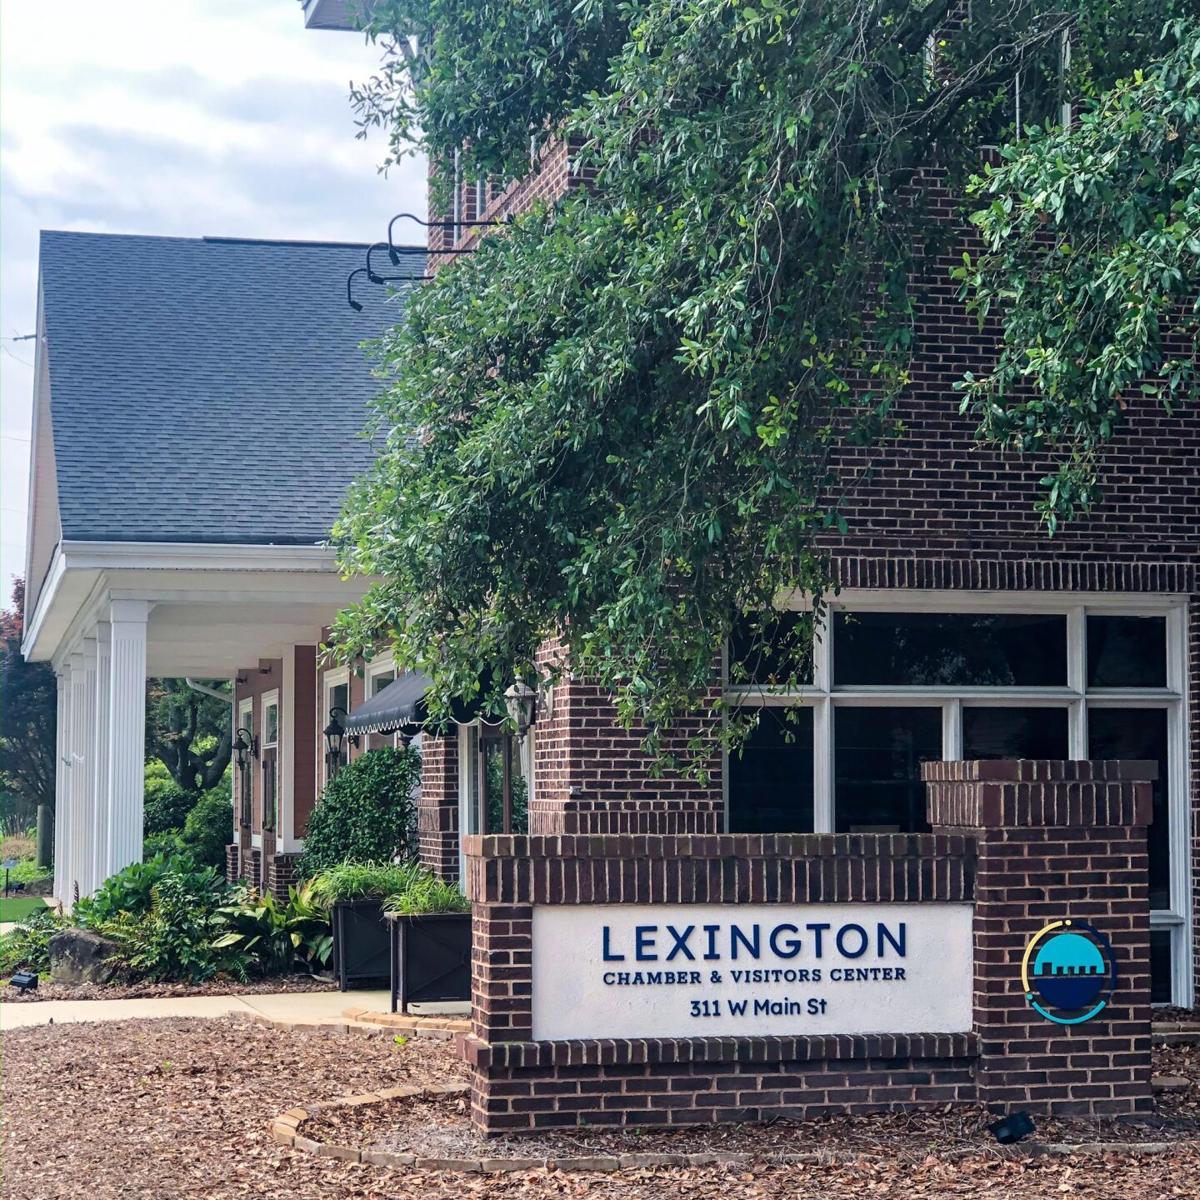 Lexington Chamber